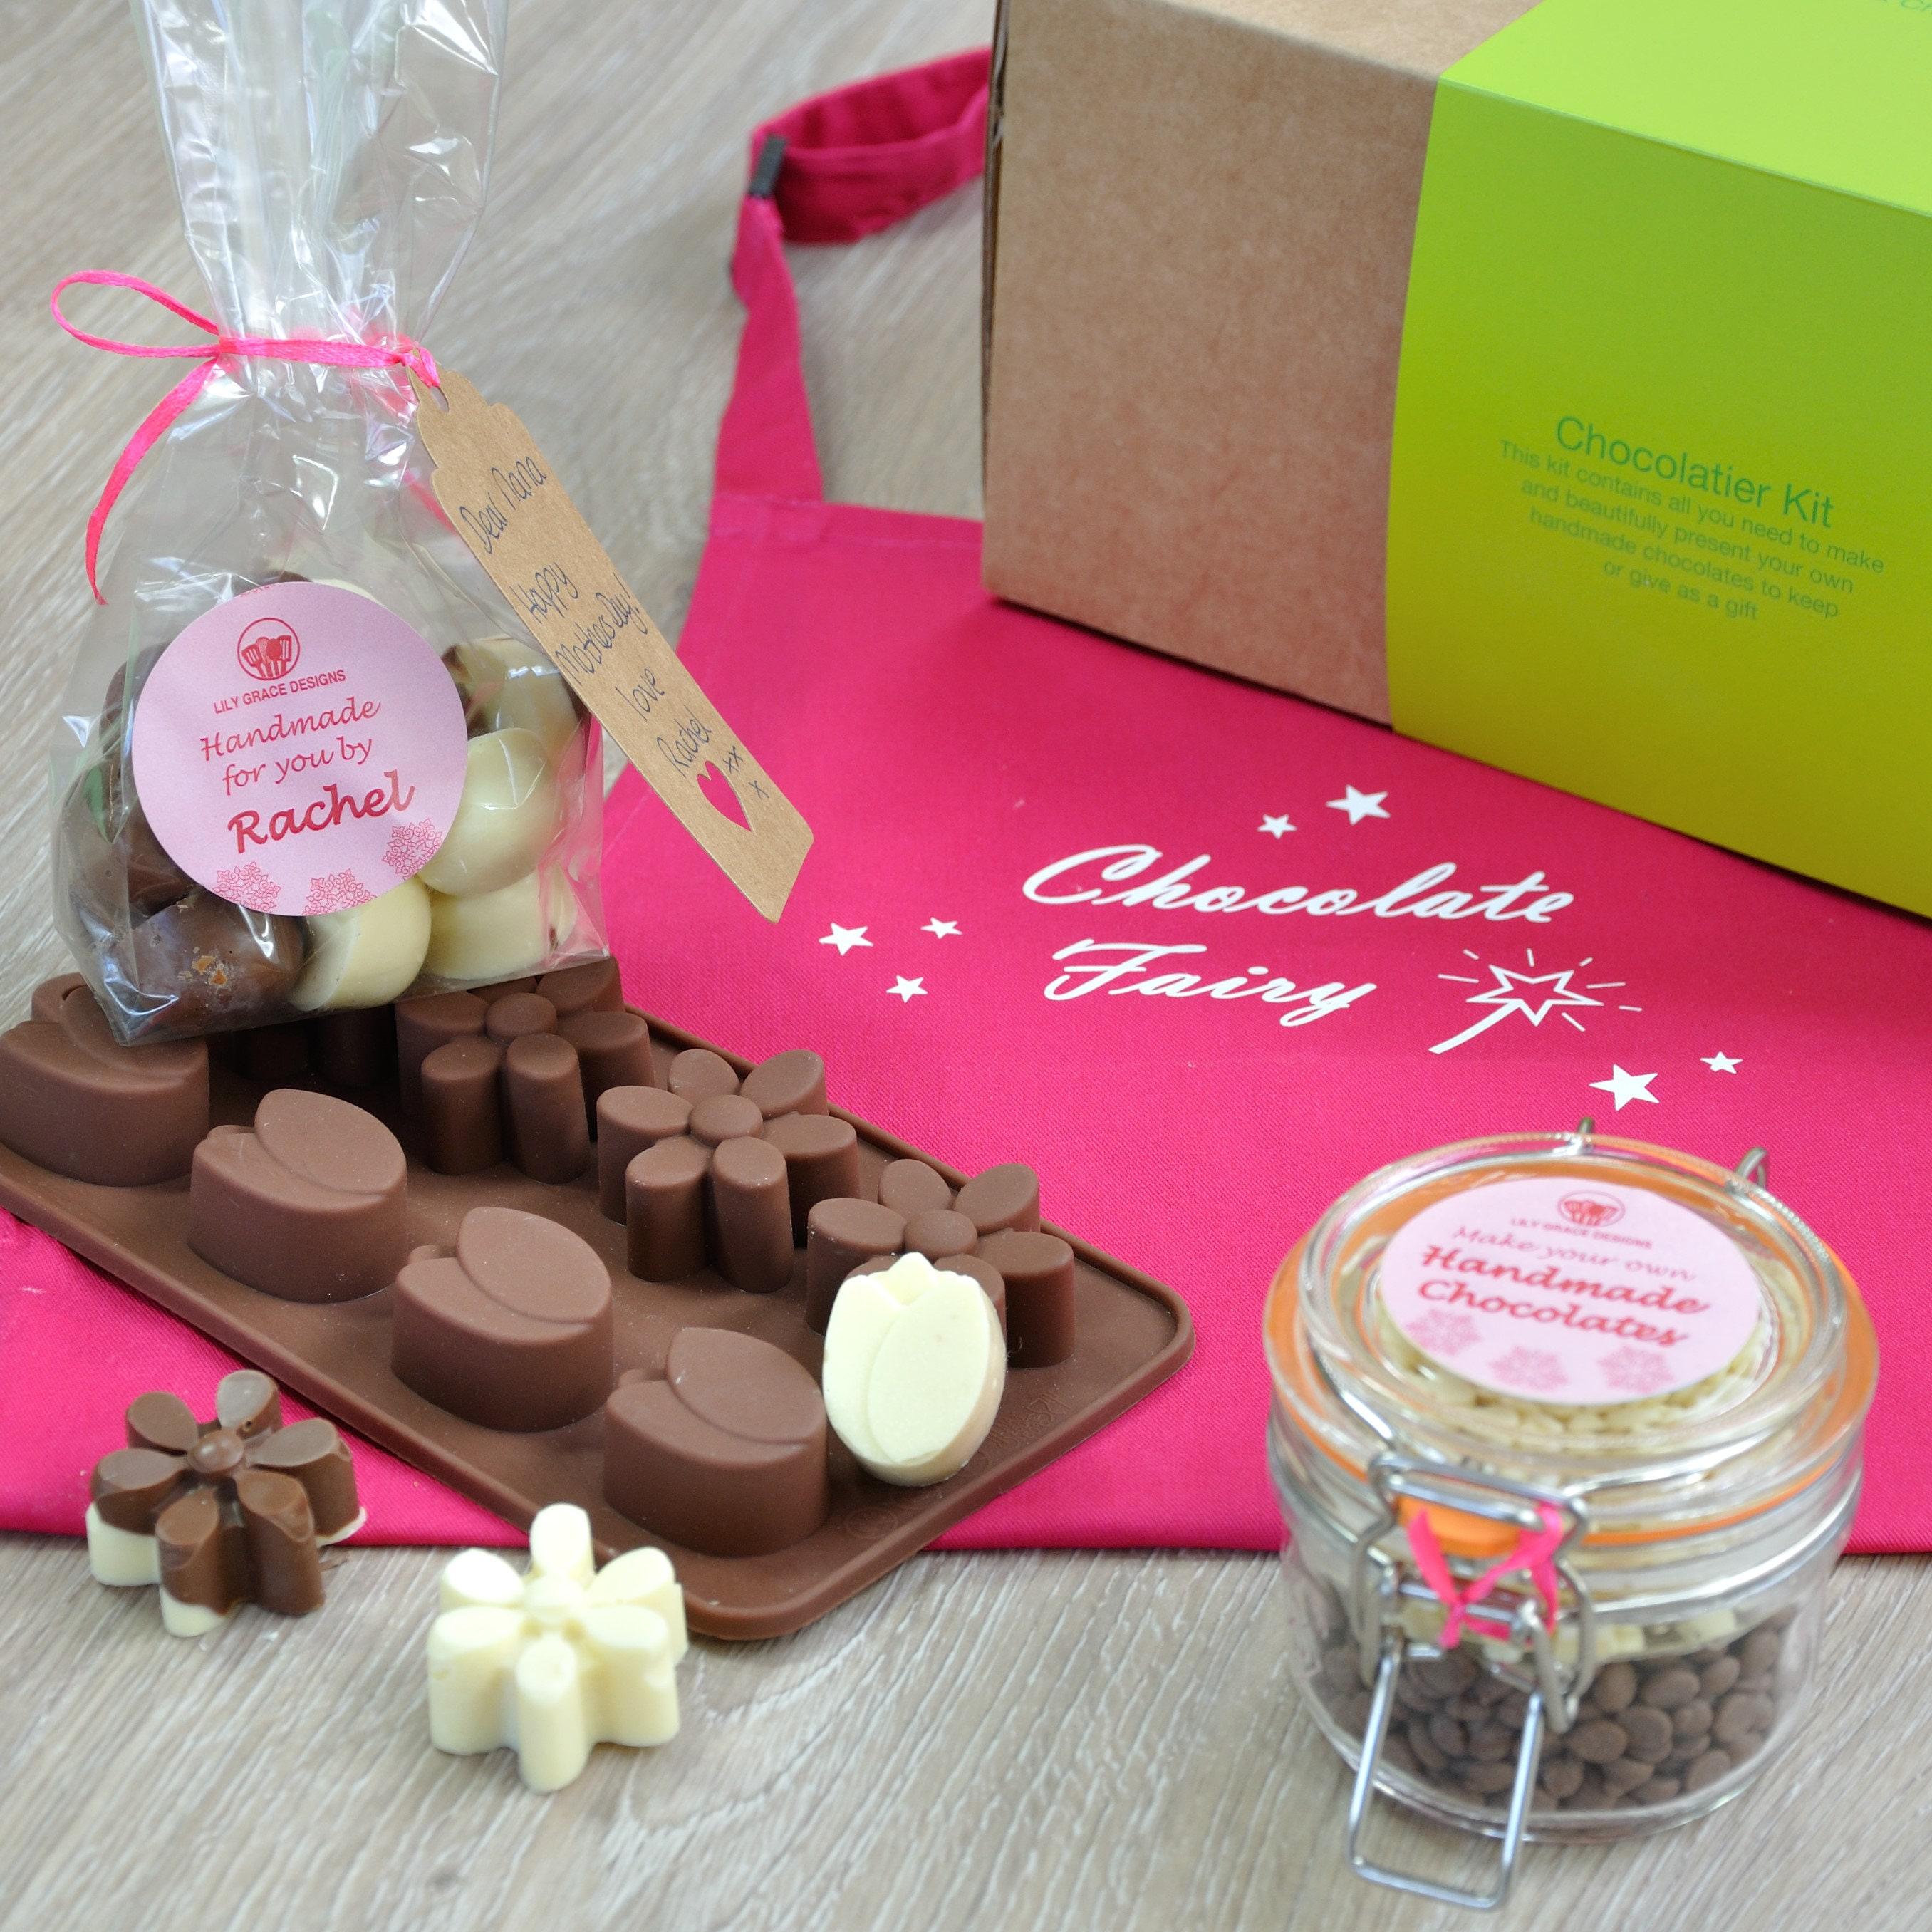 Chocolates For Nana, Aunt, Gran, Mum, Daisy chocs, tulip chocs ...